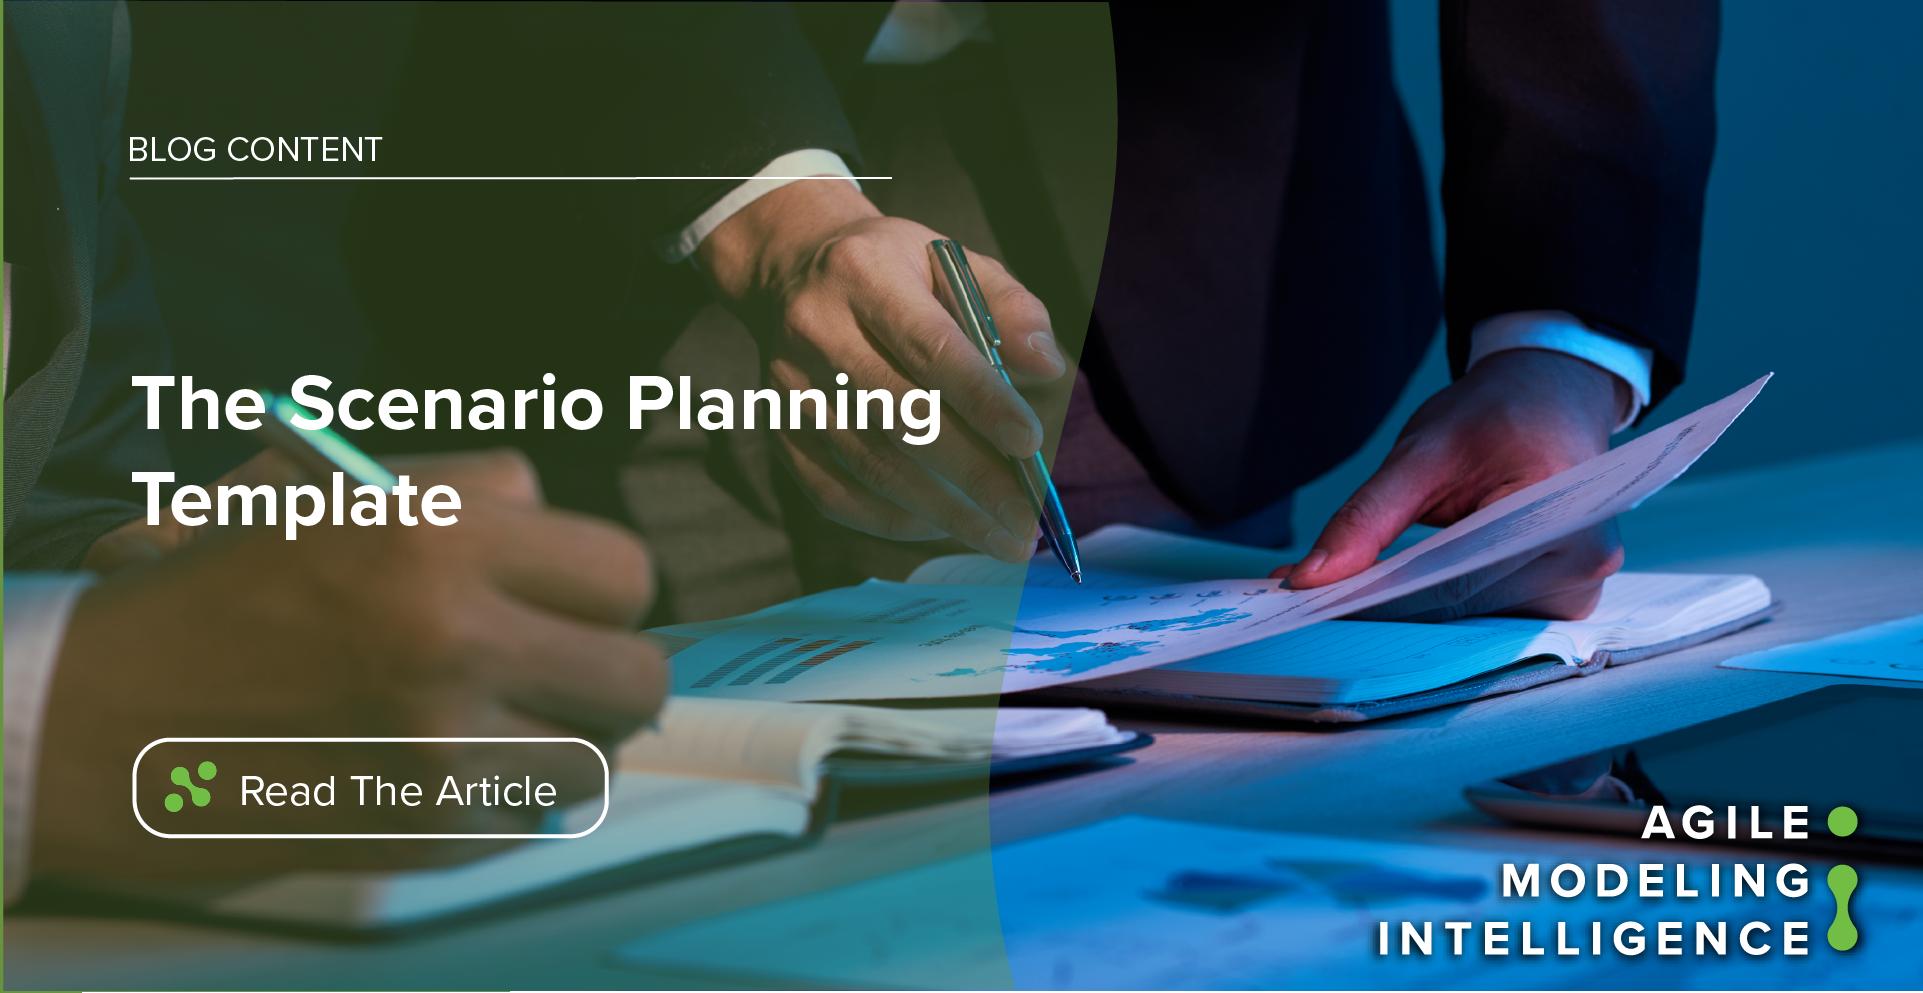 The Scenario Planning Template